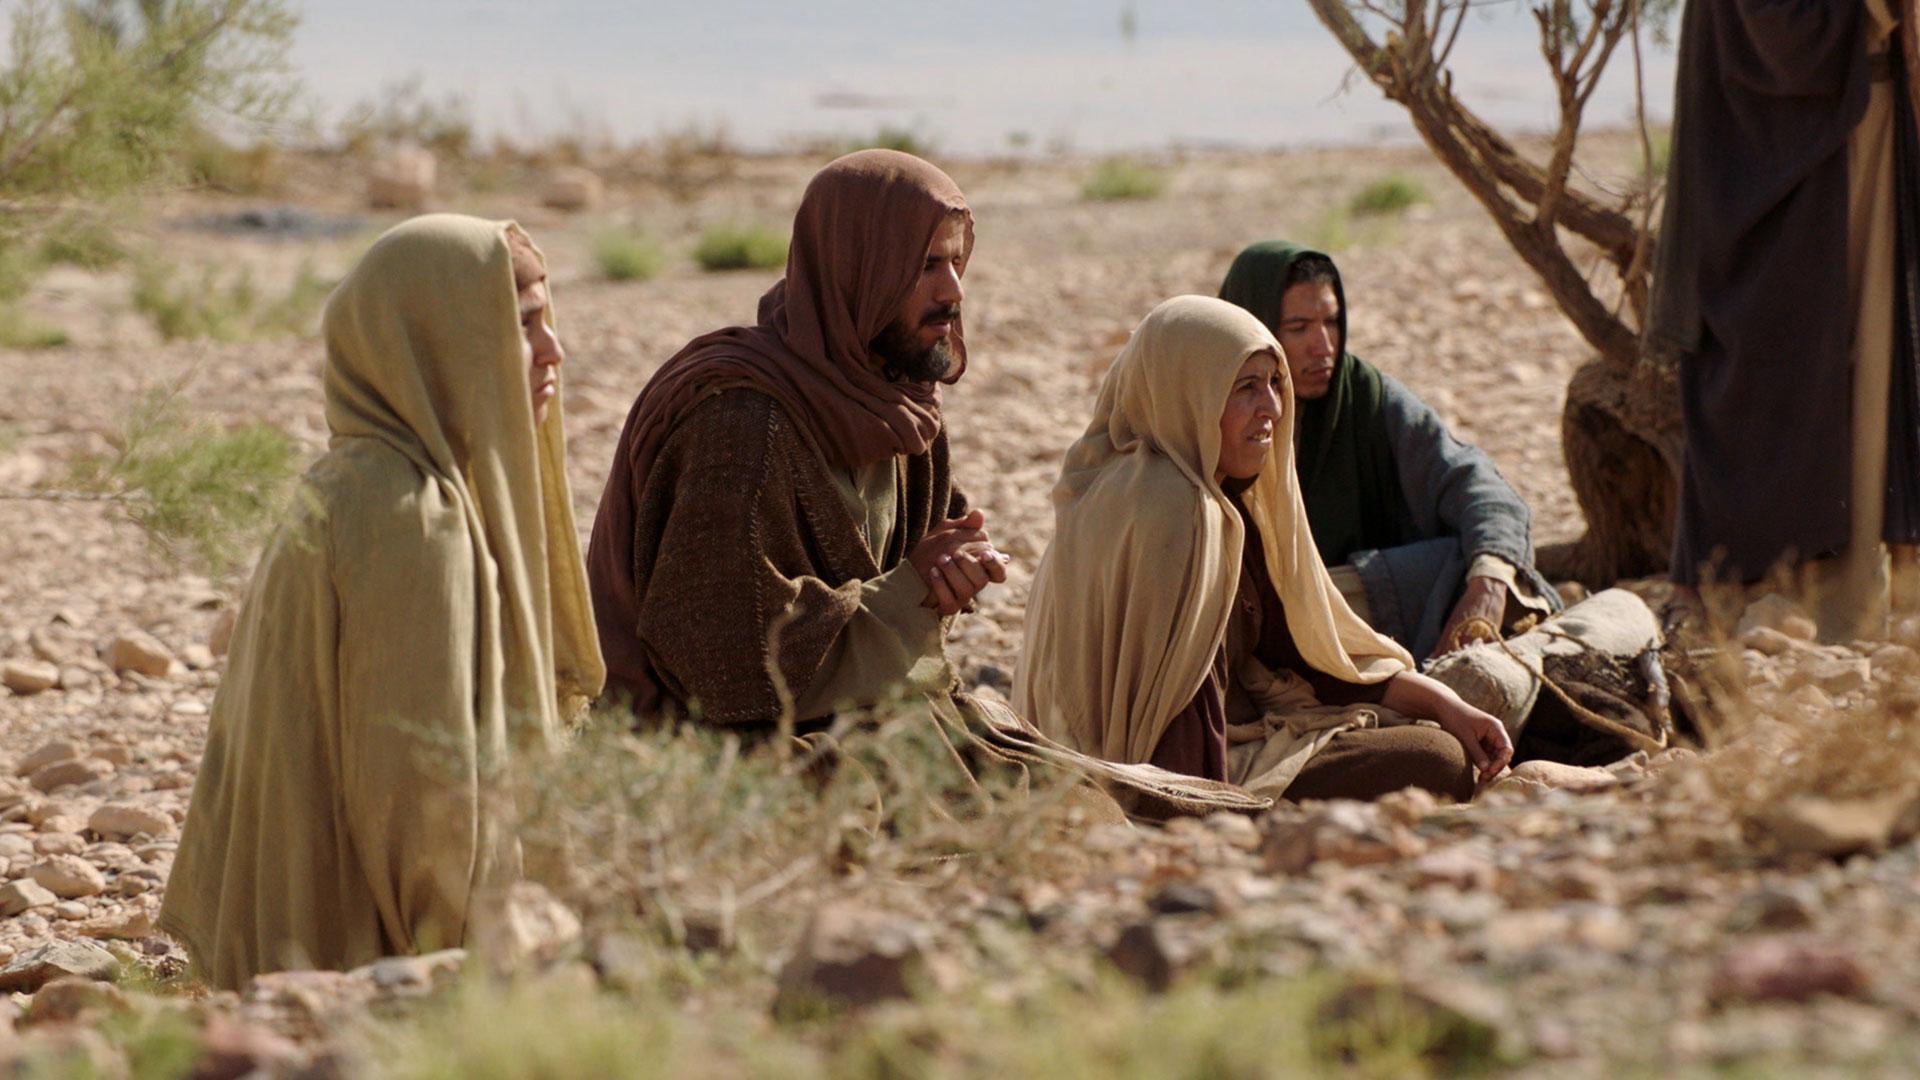 Mary Magdalene: The Crucifixion